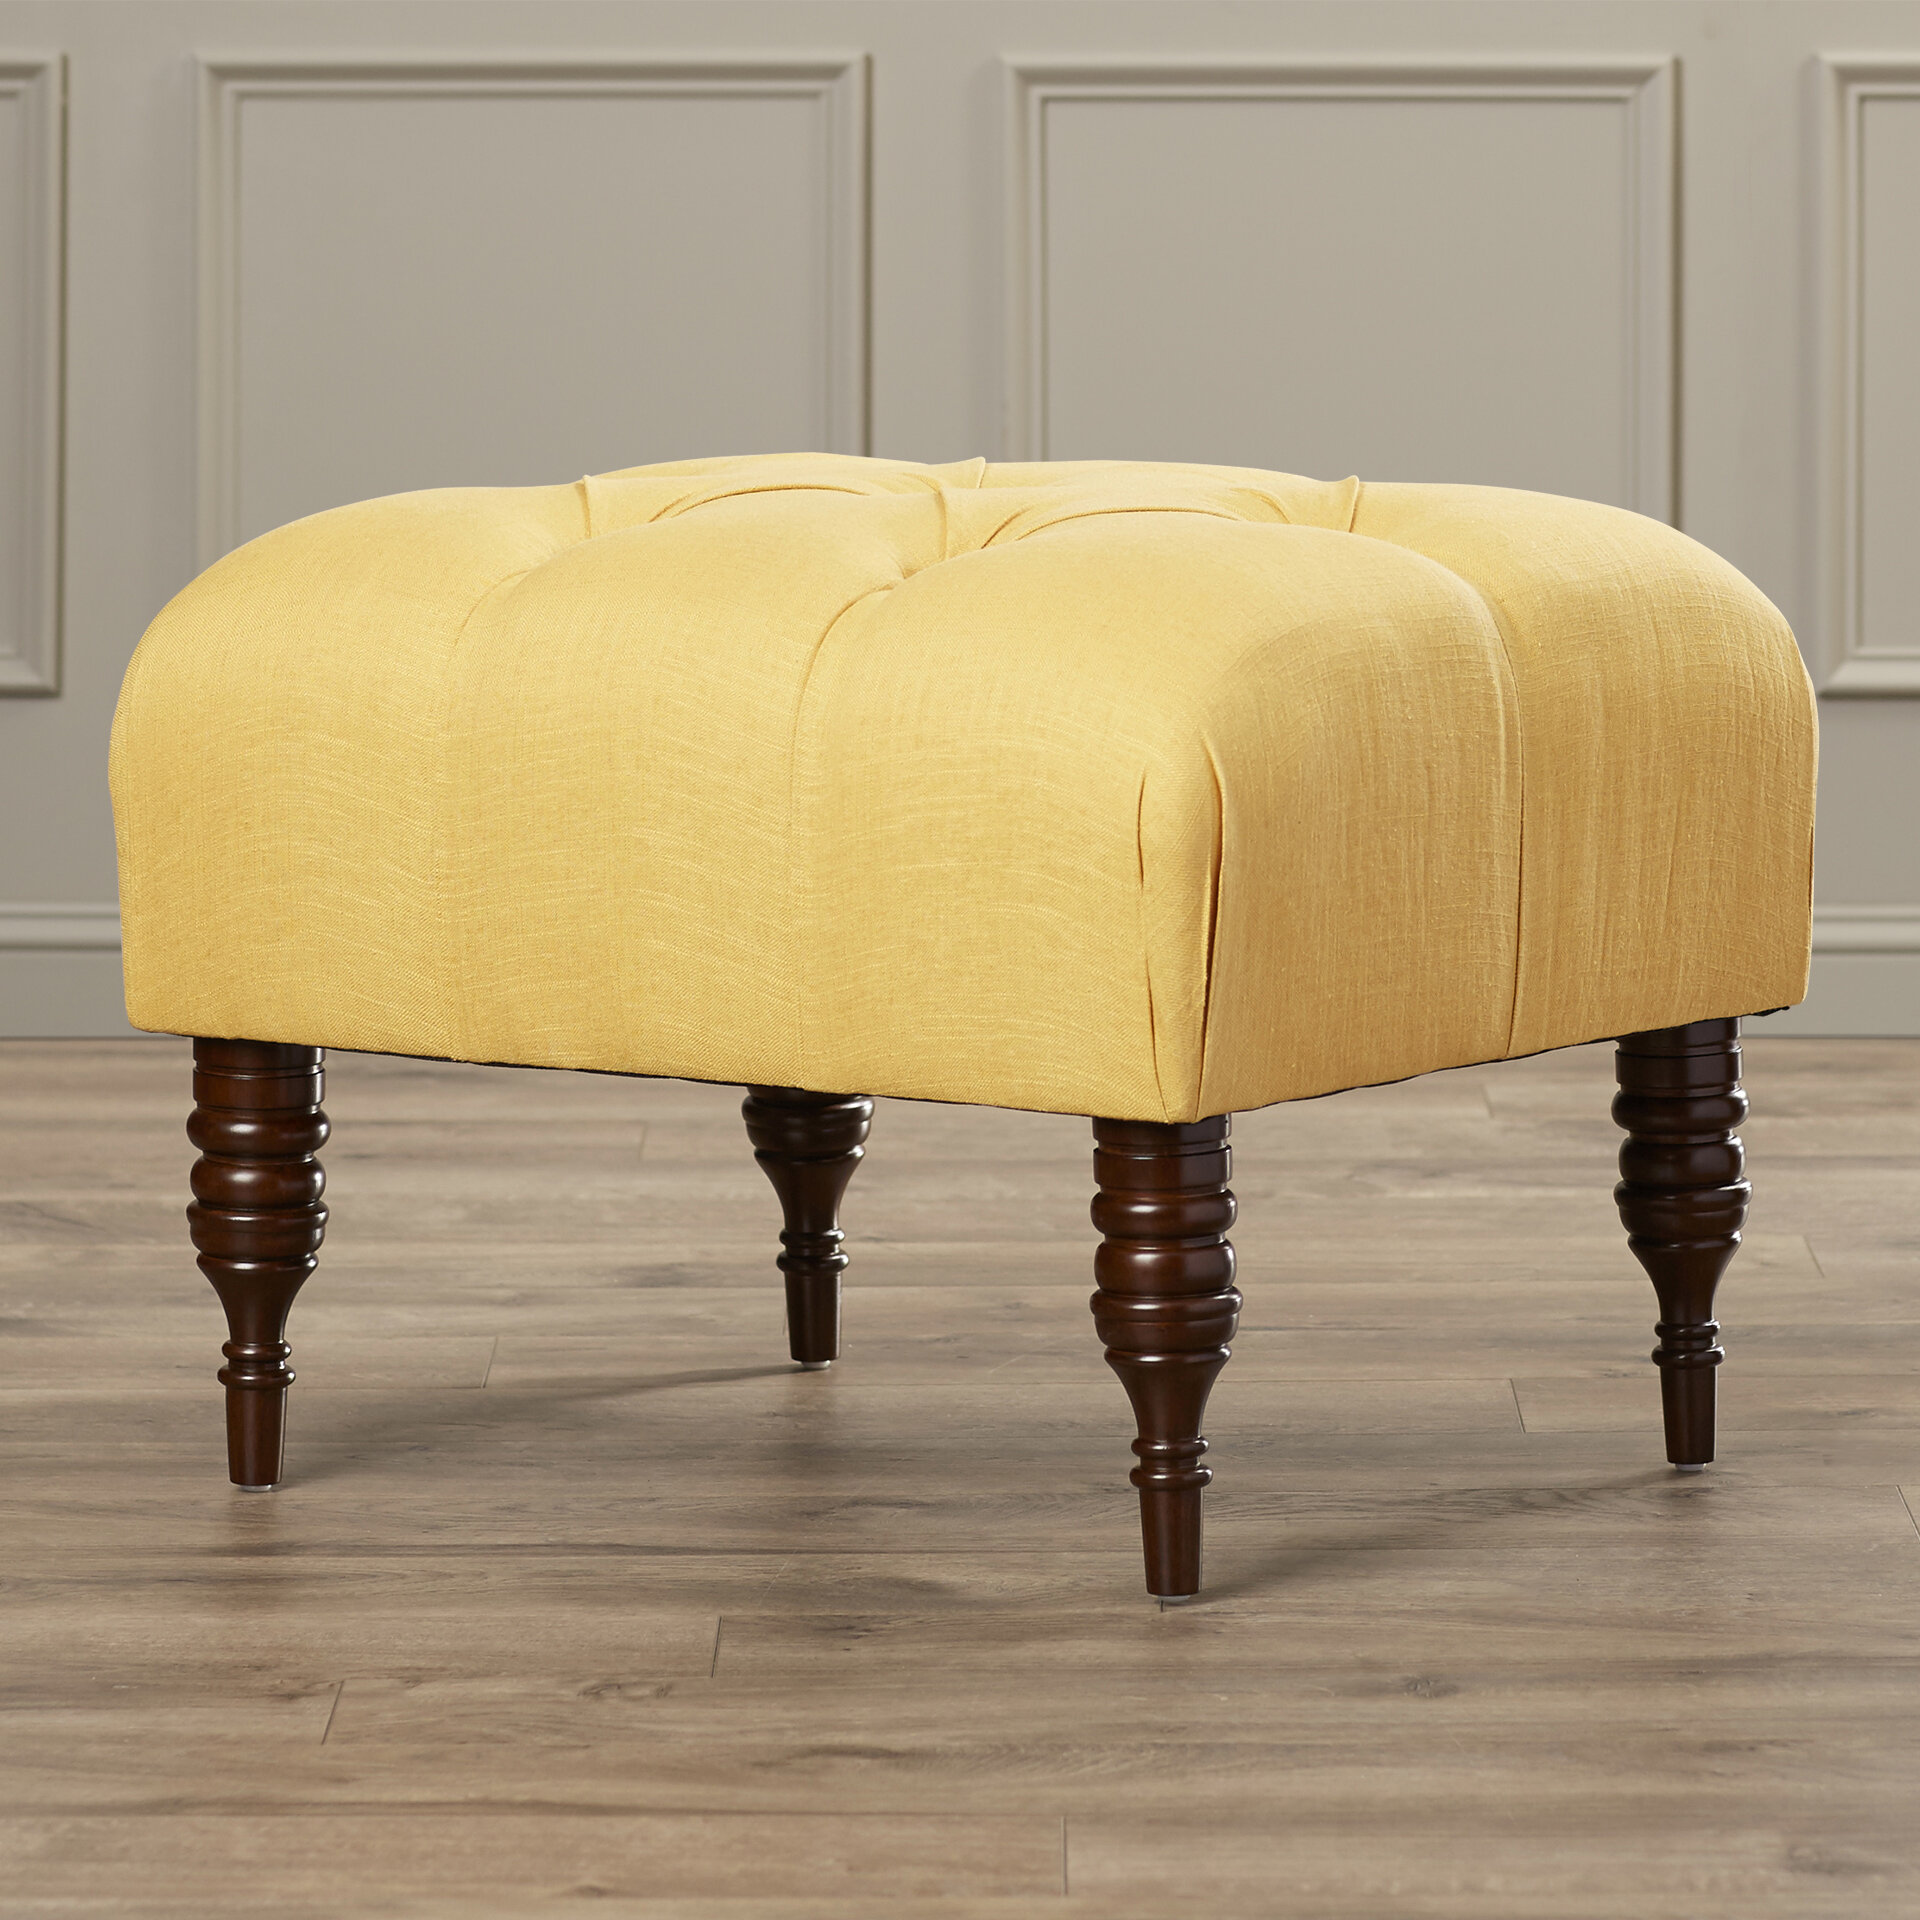 Darby Home Co Fairmount 24 5 Wide Tufted Rectangle Ottoman Reviews Wayfair